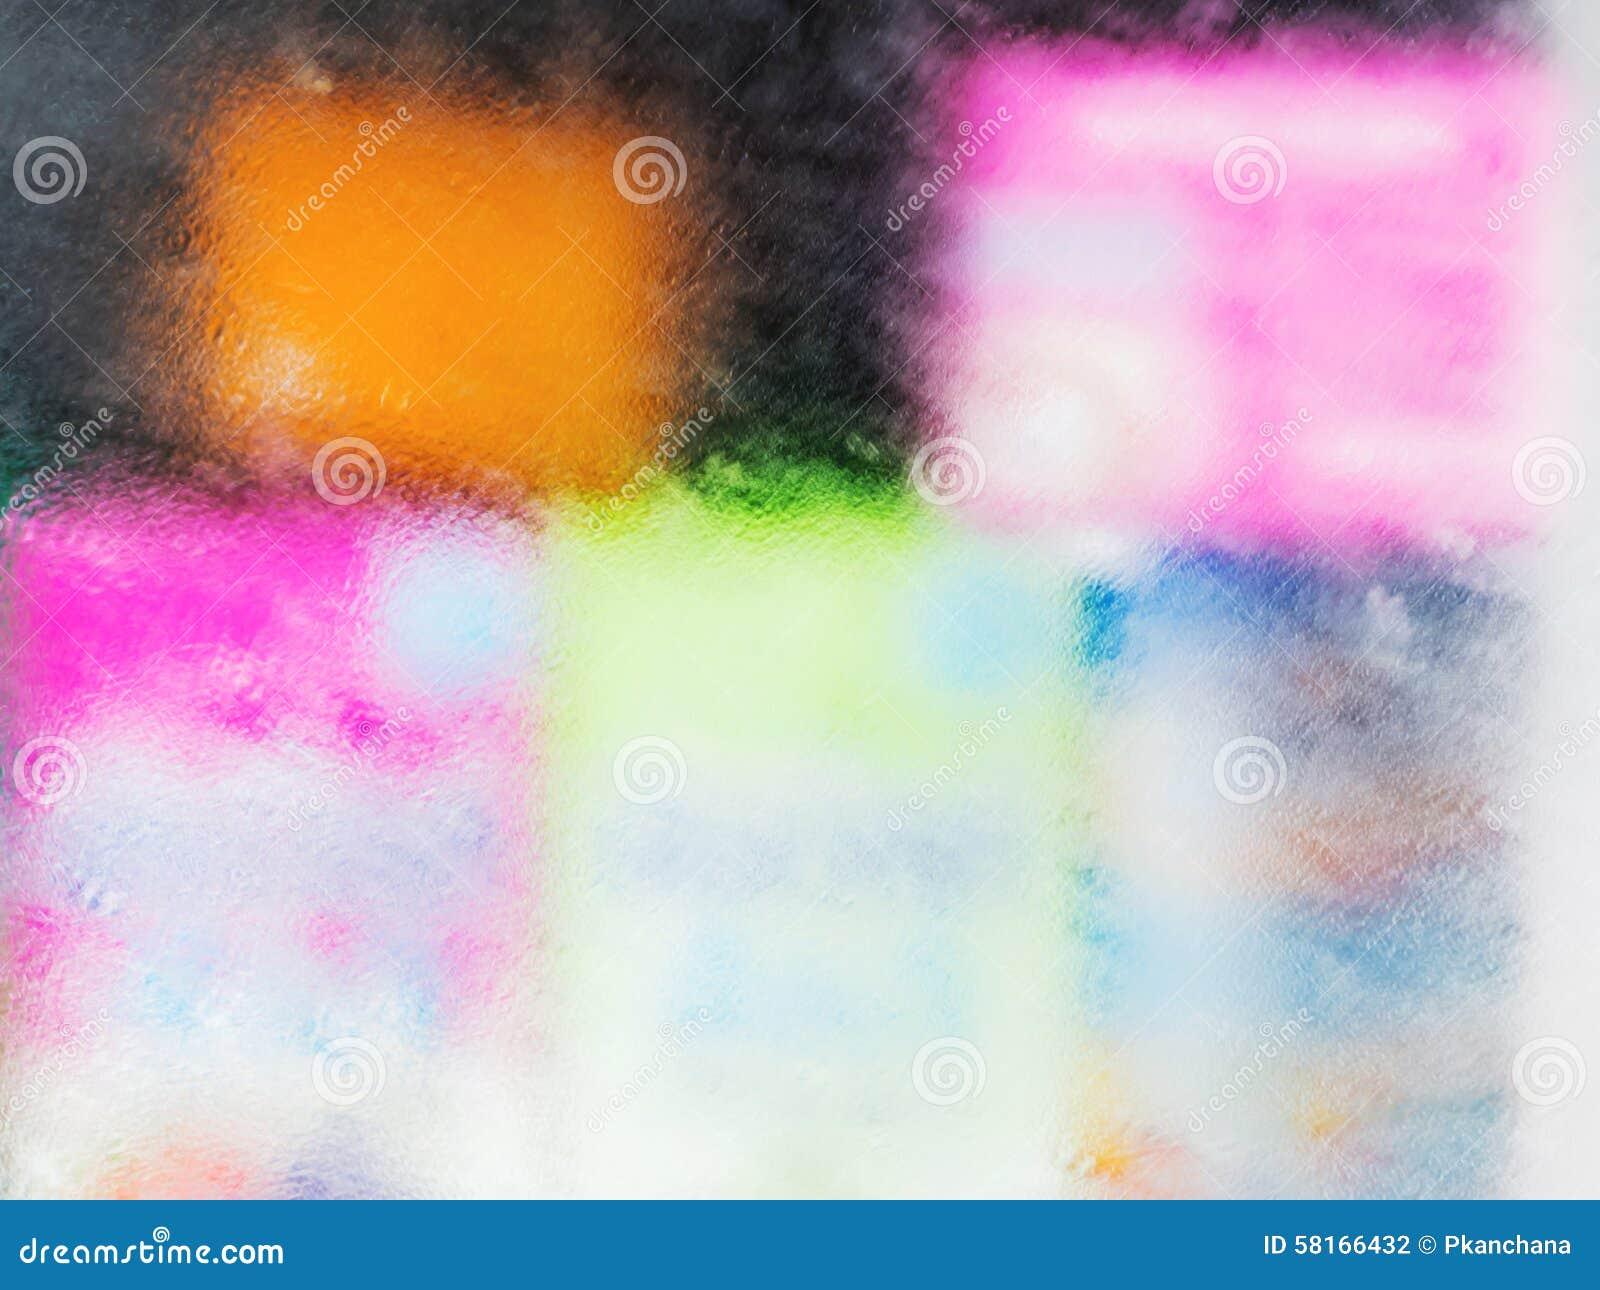 The Mist On Glass Window Of Refrigerator Stock Photo Image